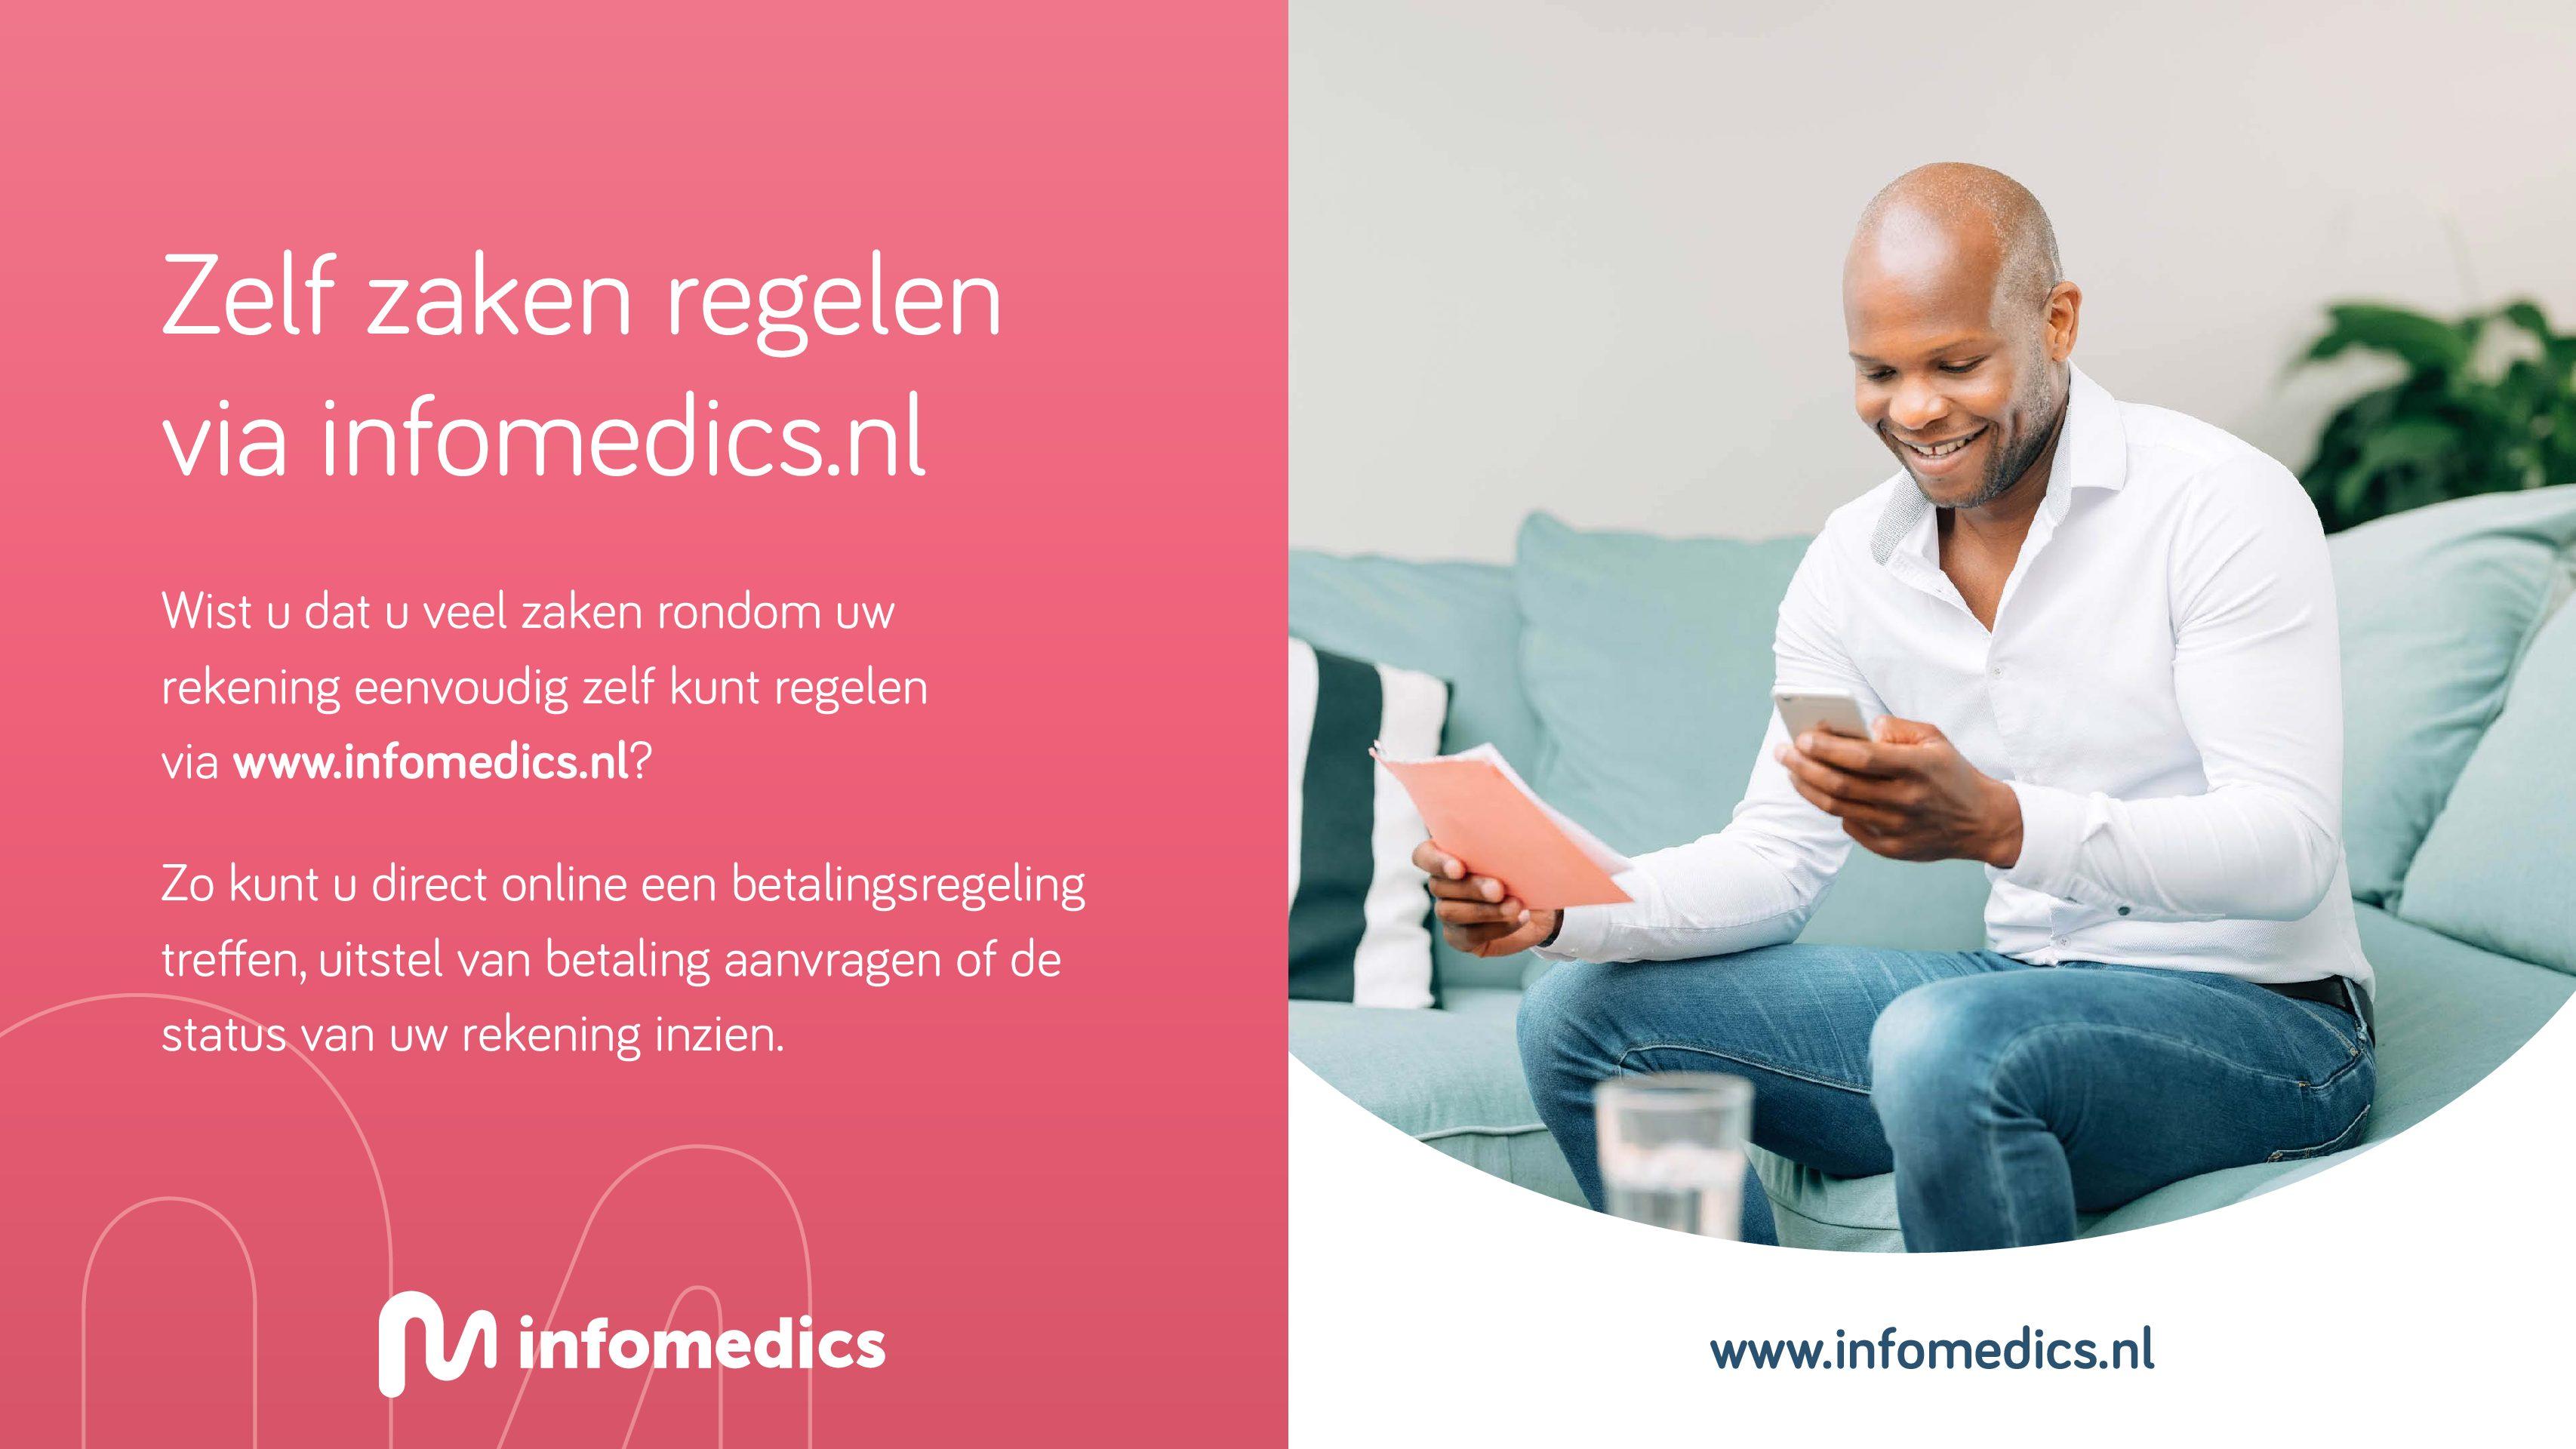 02 – Zelf zaken regelen via infomedics.nl